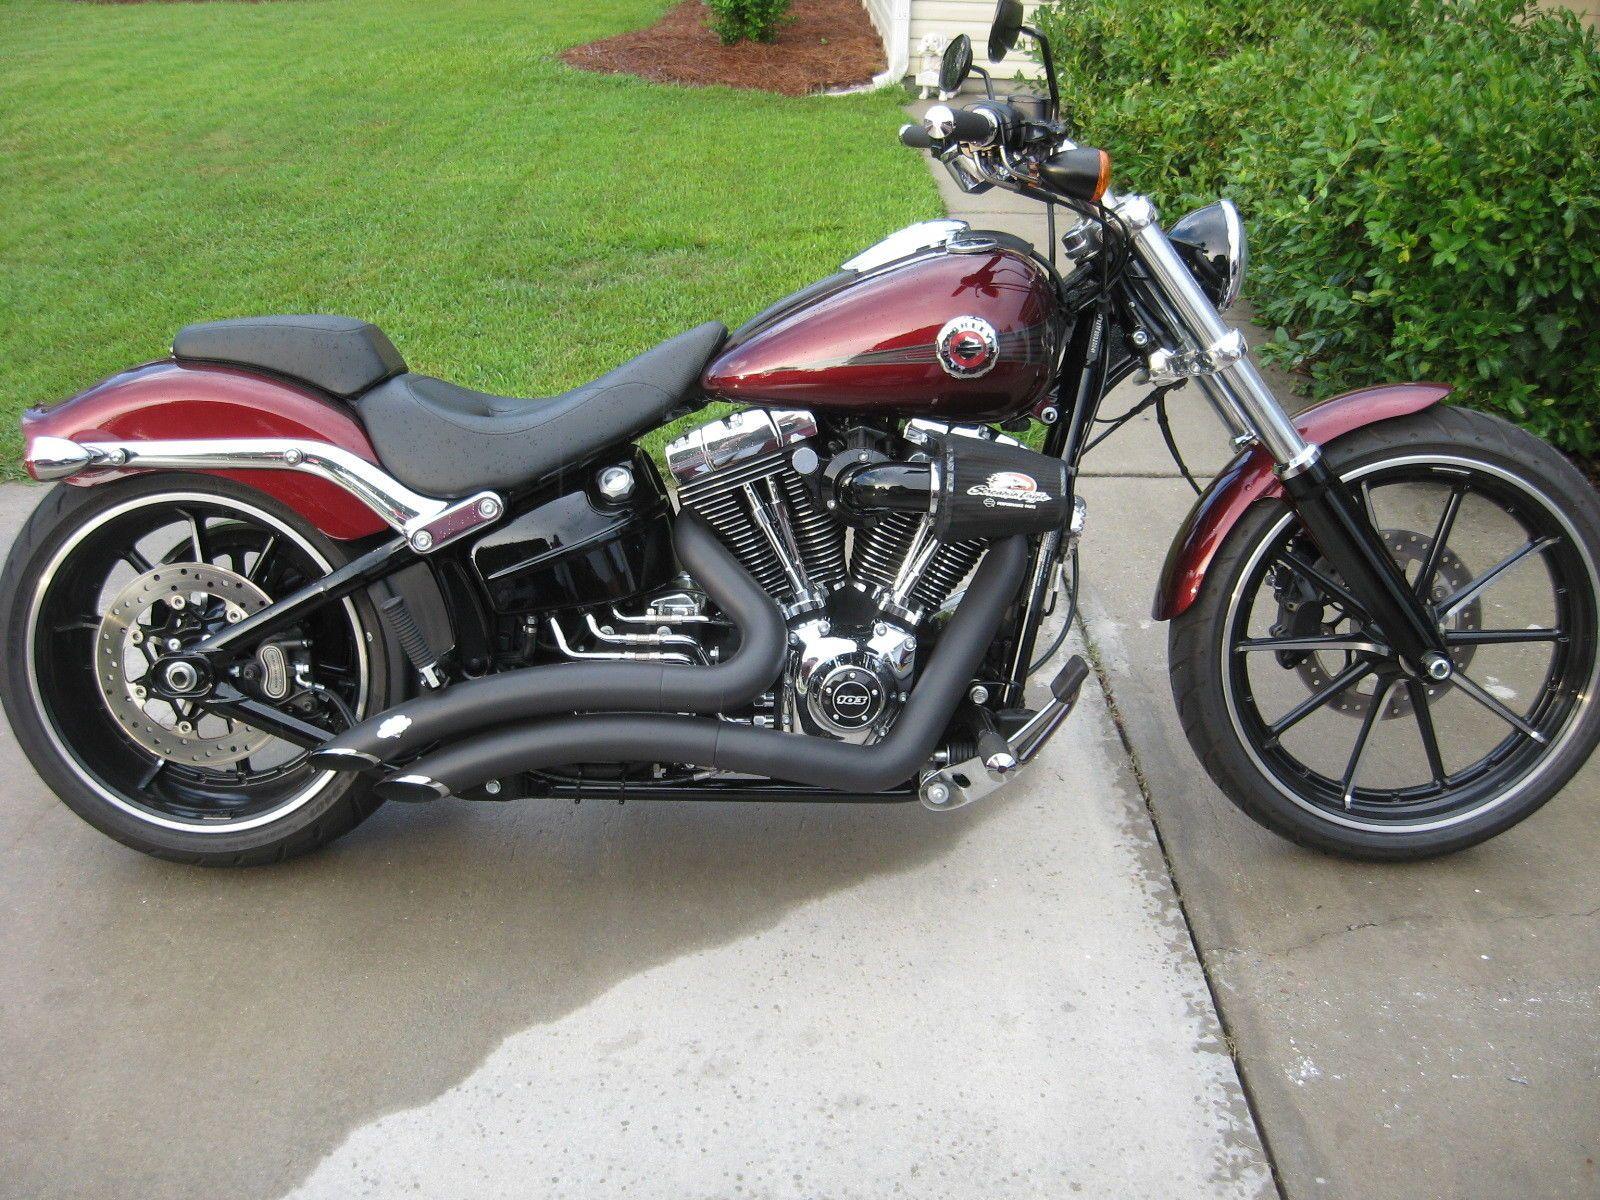 eBay: 2015 Harley-Davidson Softail 2015 Harley-Davidson Softail Breakout fxsb #h…